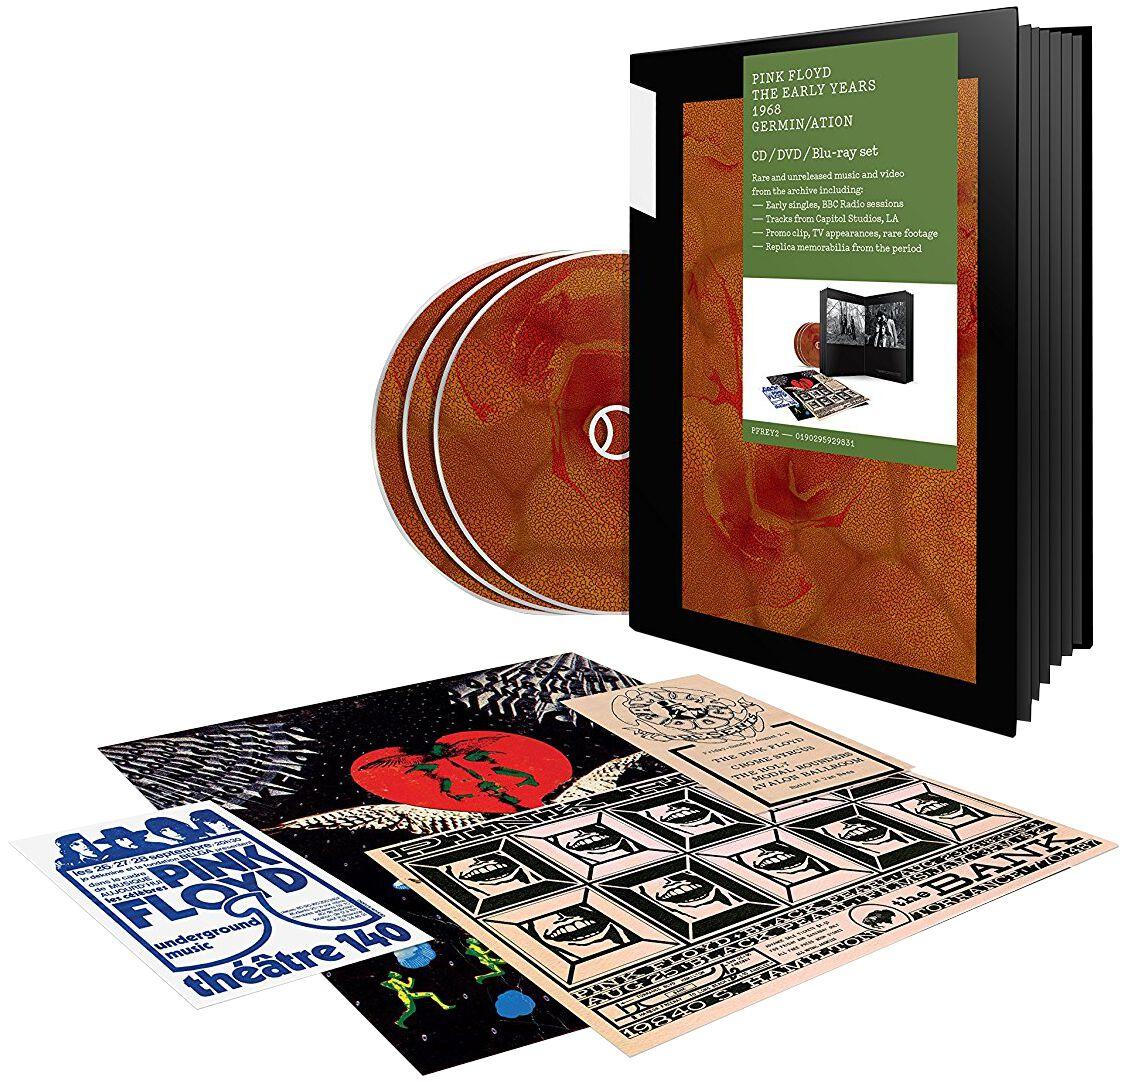 Image of   Pink Floyd 1968 Germin/Ation CD & DVD & Blu-ray standard